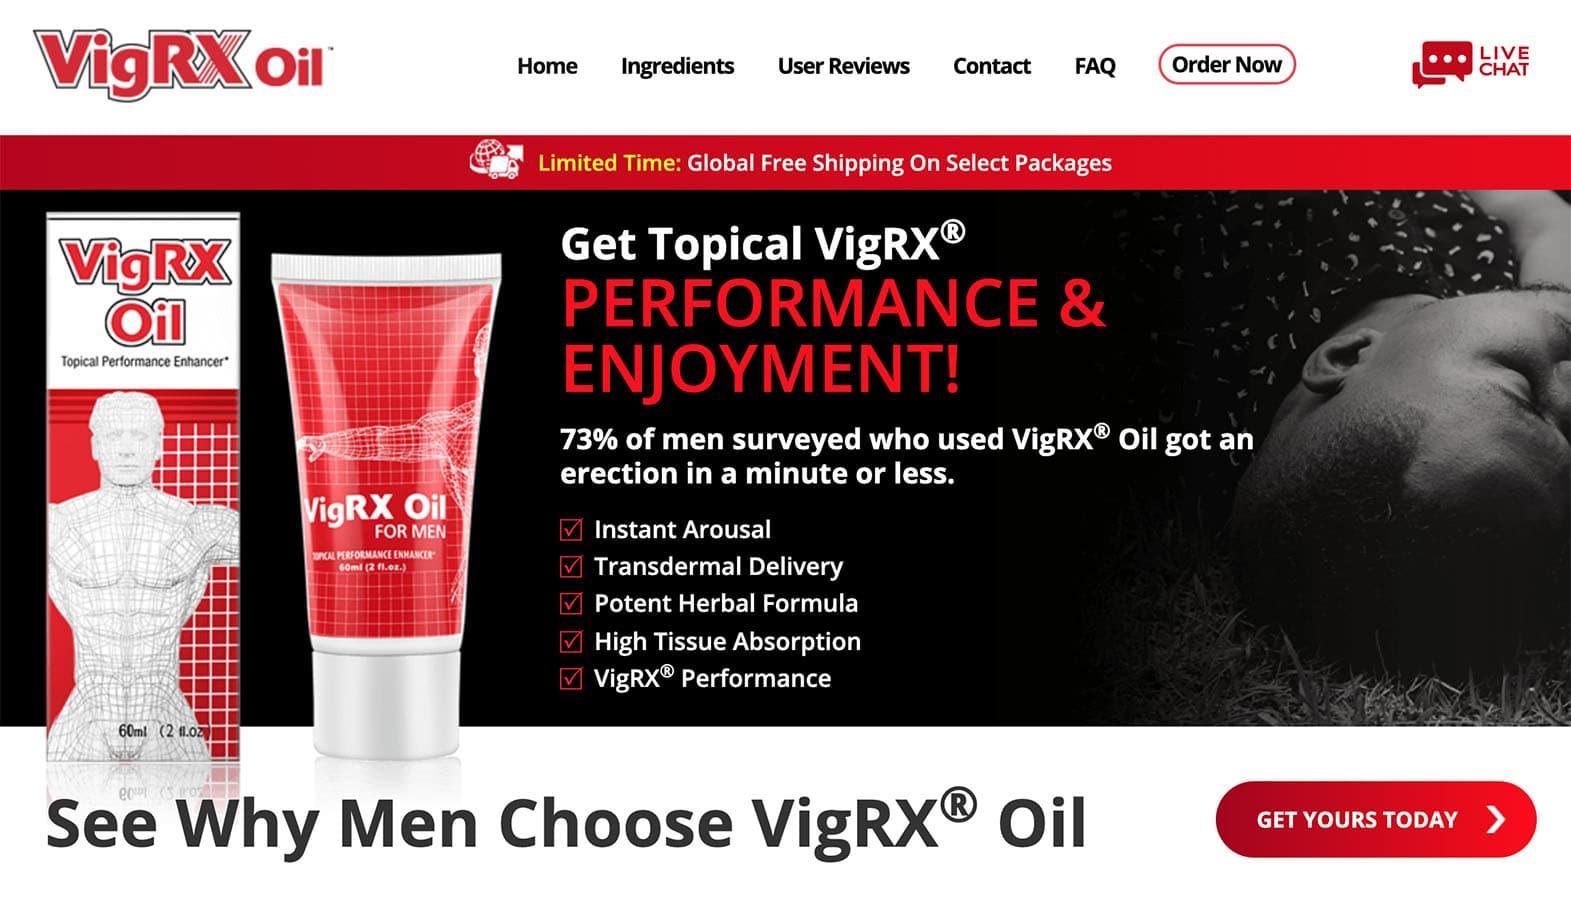 VigRX Oil UK Website